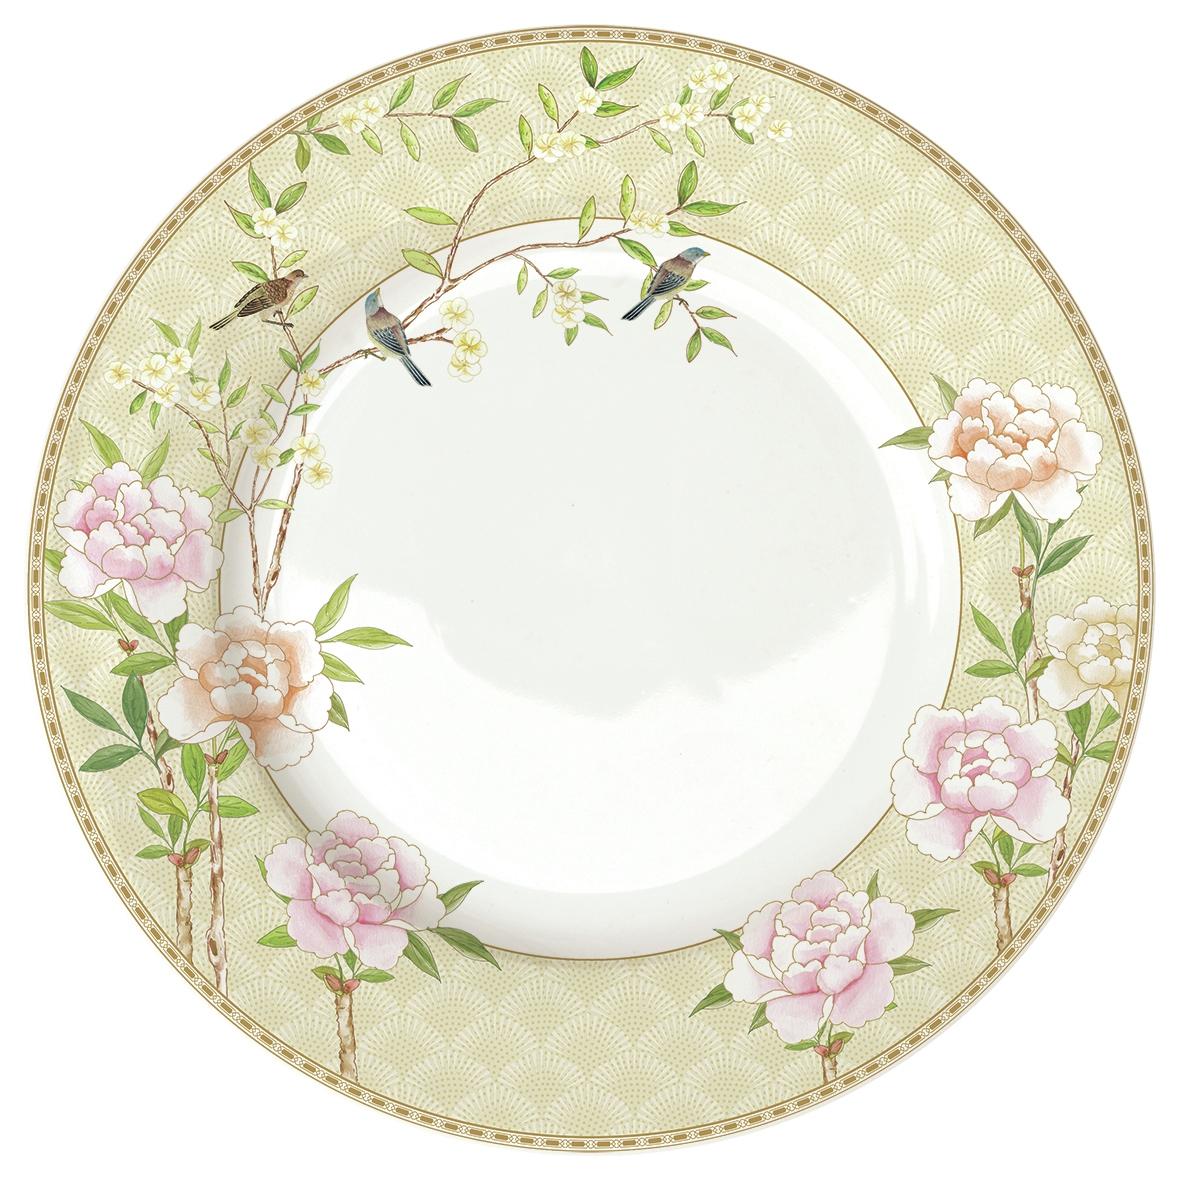 Feeding plate 27cm - Palace Garden Floral